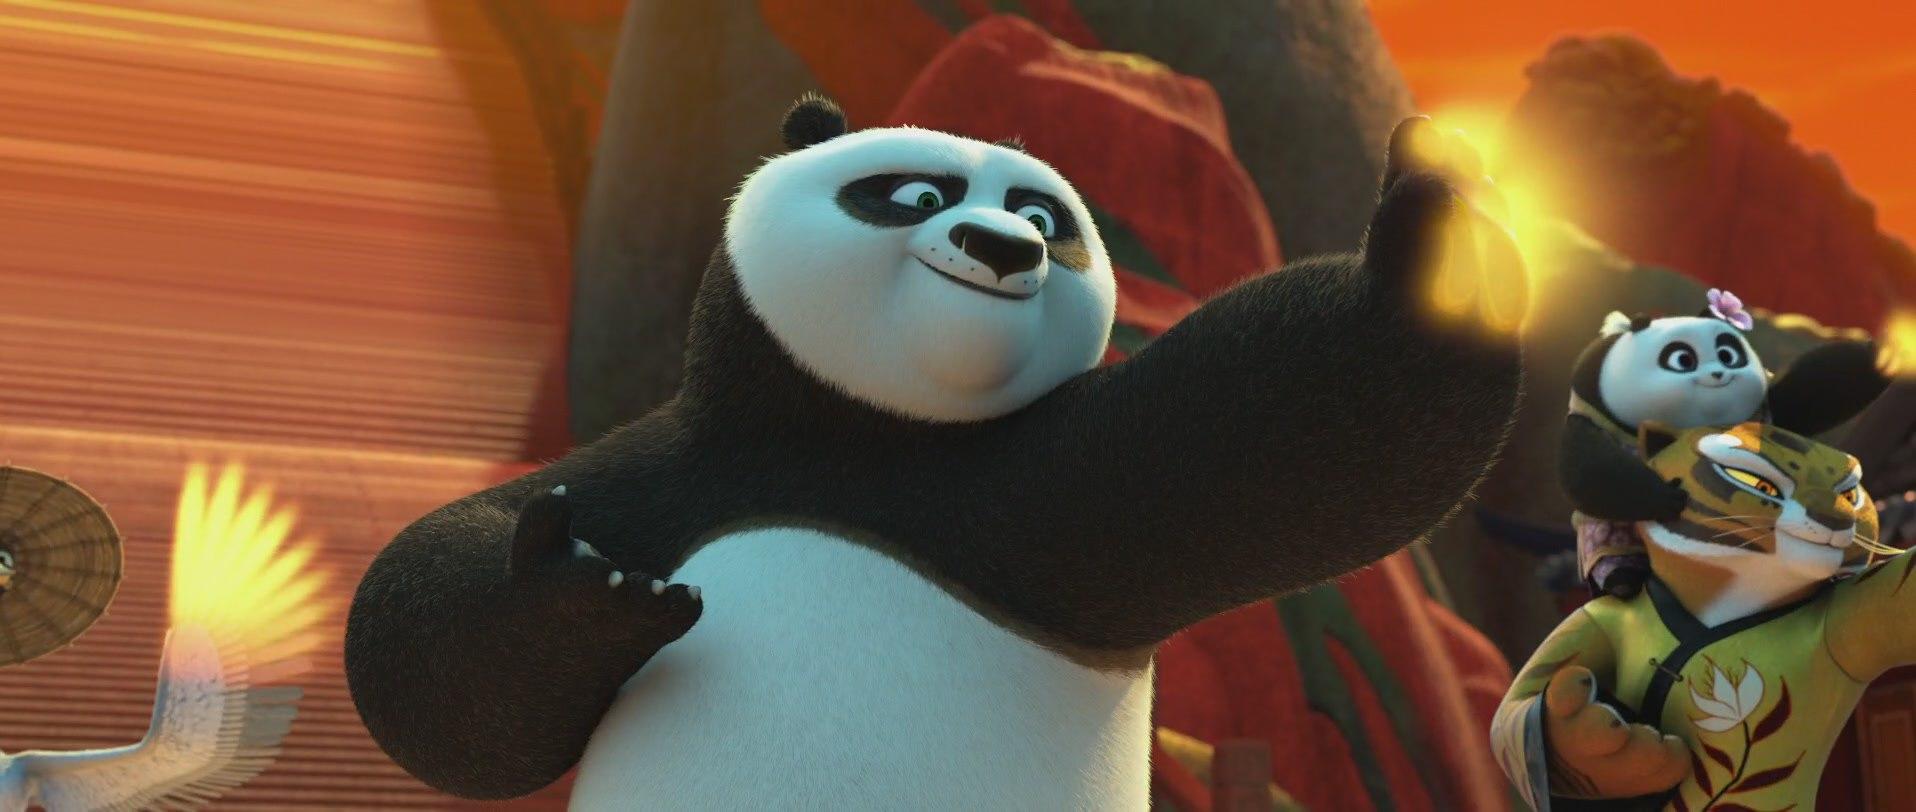 панда кунг-фу показывает силу цинь